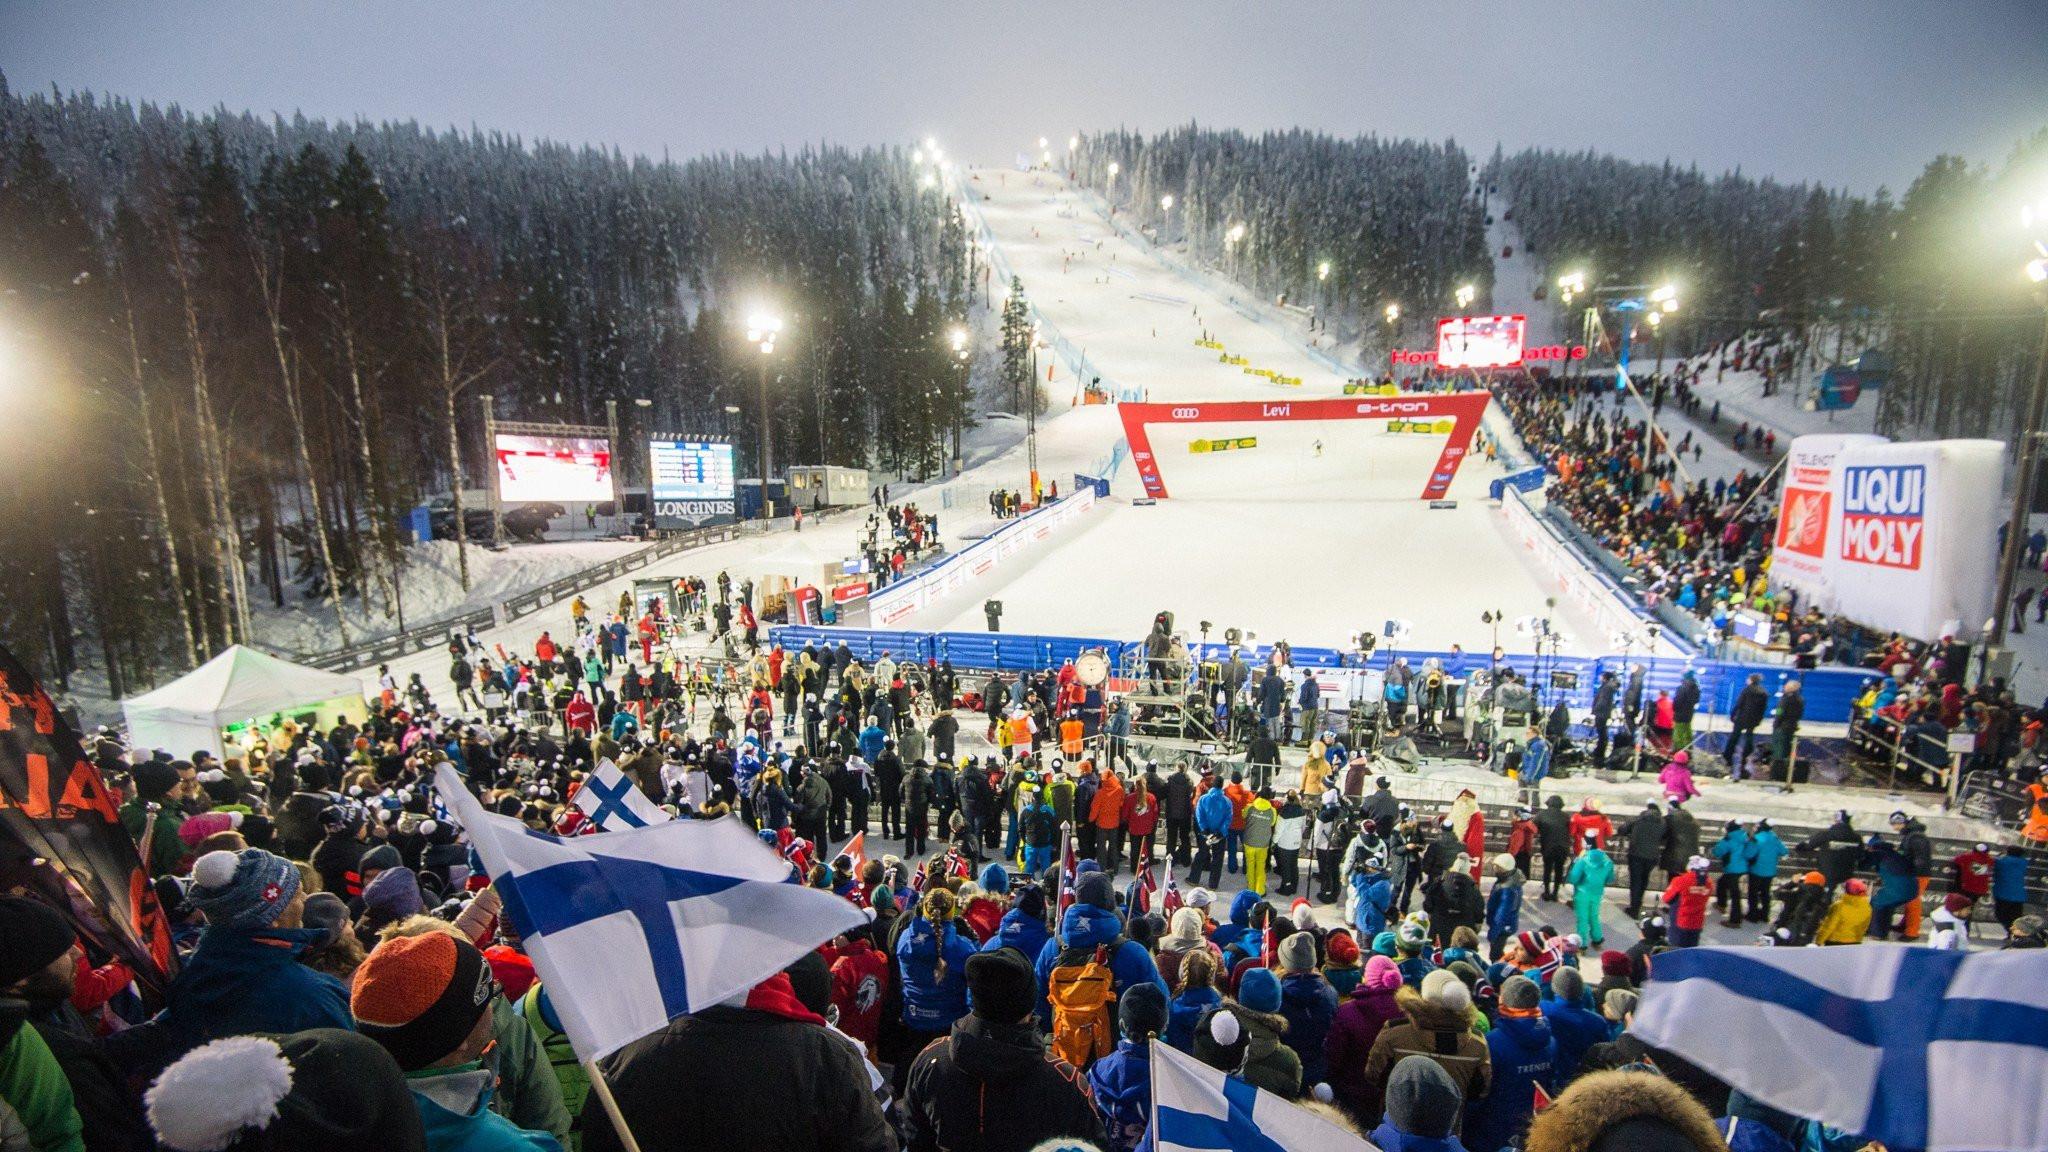 Levi is set to host the second leg of the Women's FIS Alpine Ski World Cup ©Levi Ski Resort